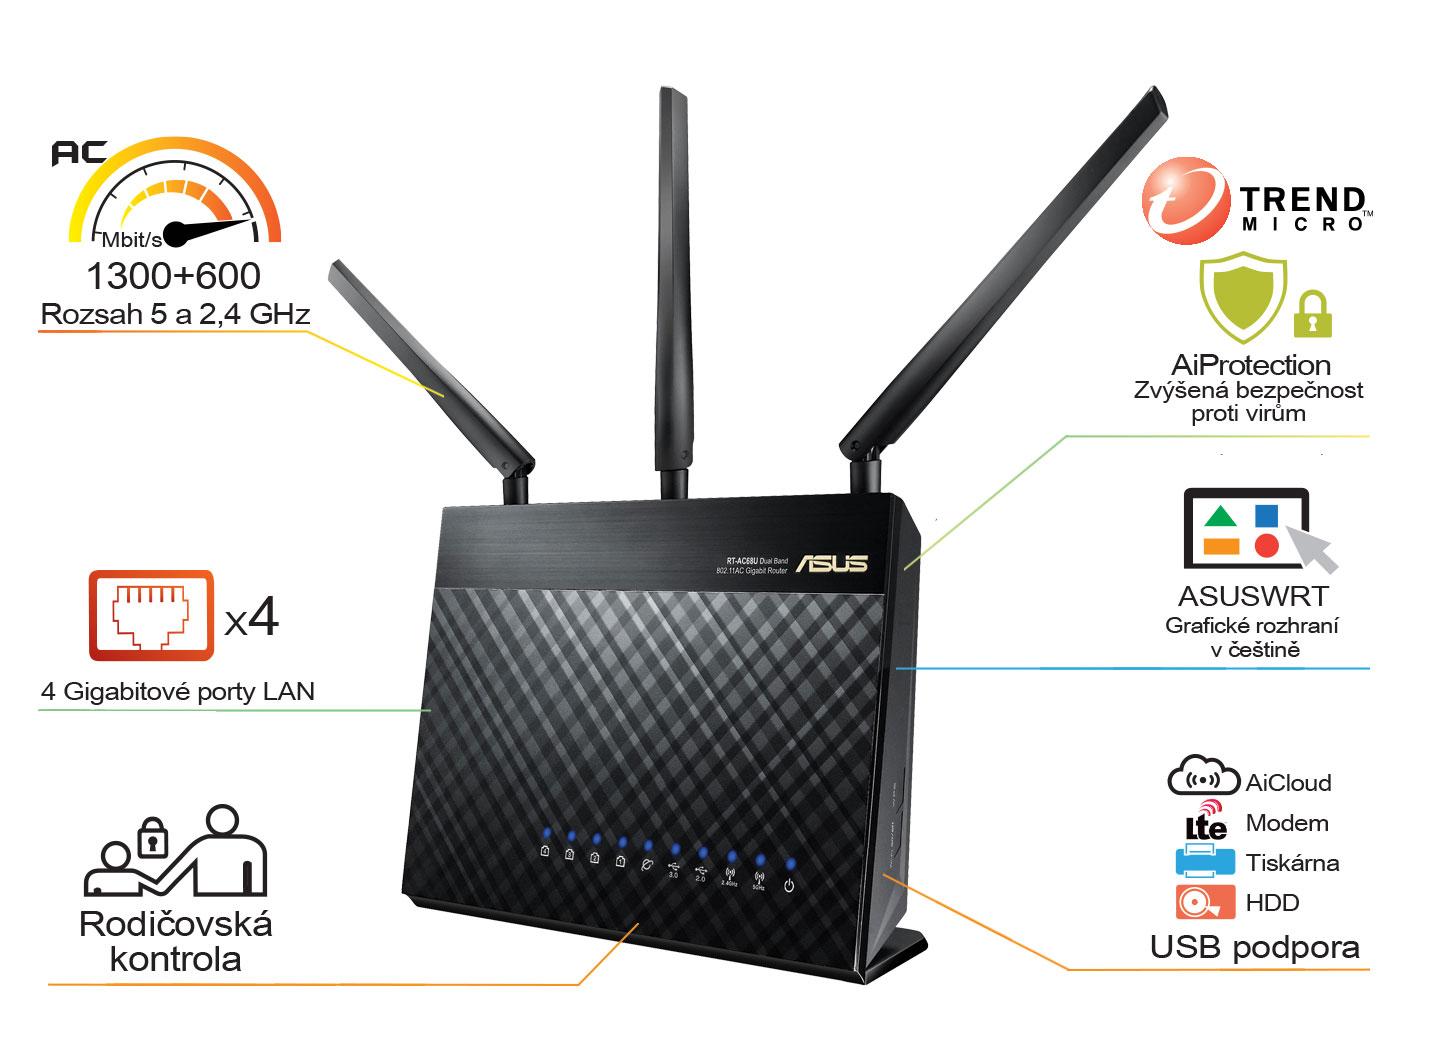 Asus RT-AC68U Dual-Band Wireless 802.11ac-AC1900 Gigabit Router USB 3.0